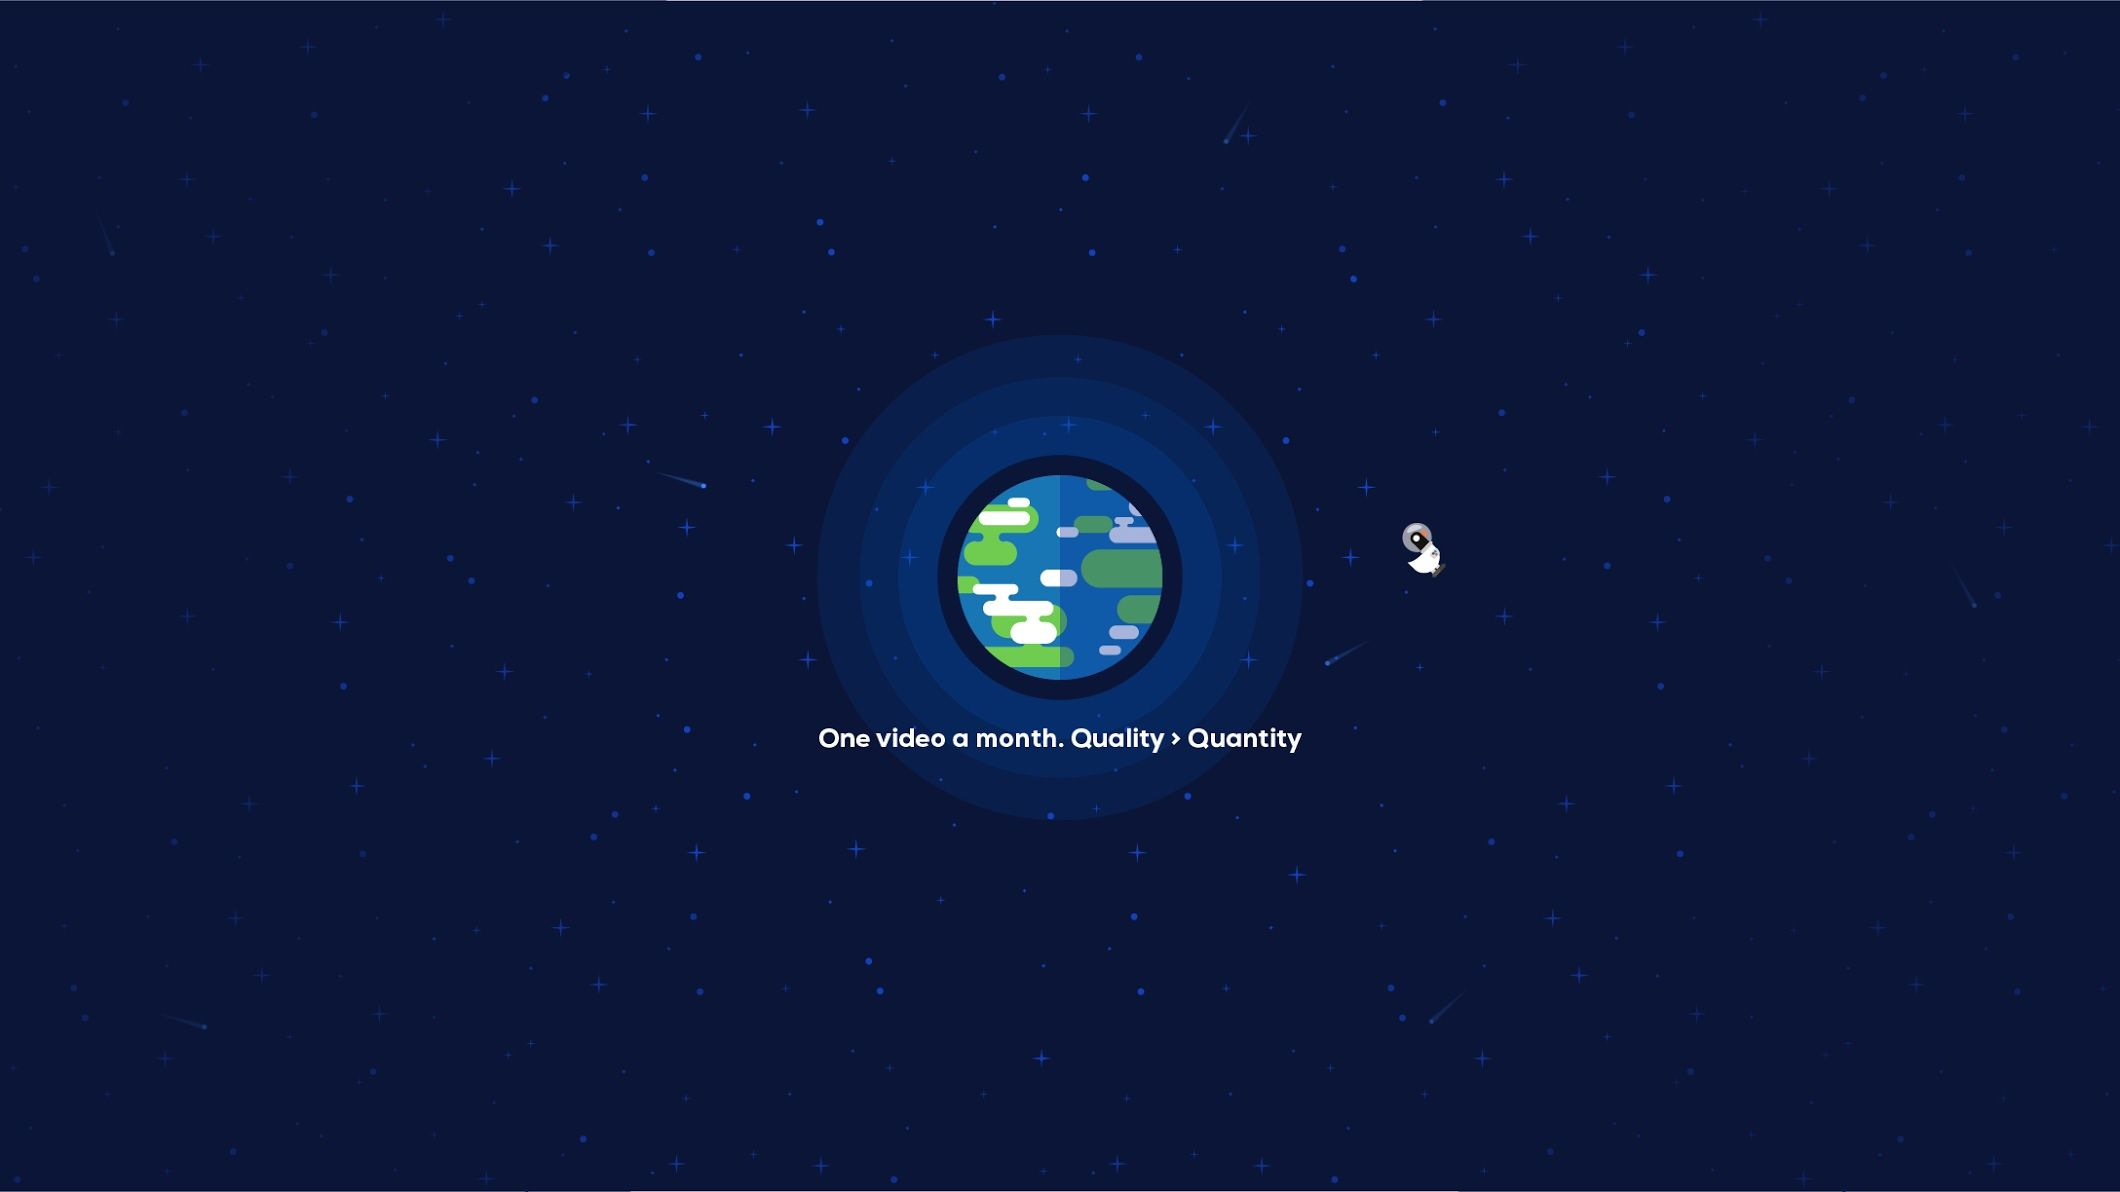 worlds a drift in a nutshell - YouTube